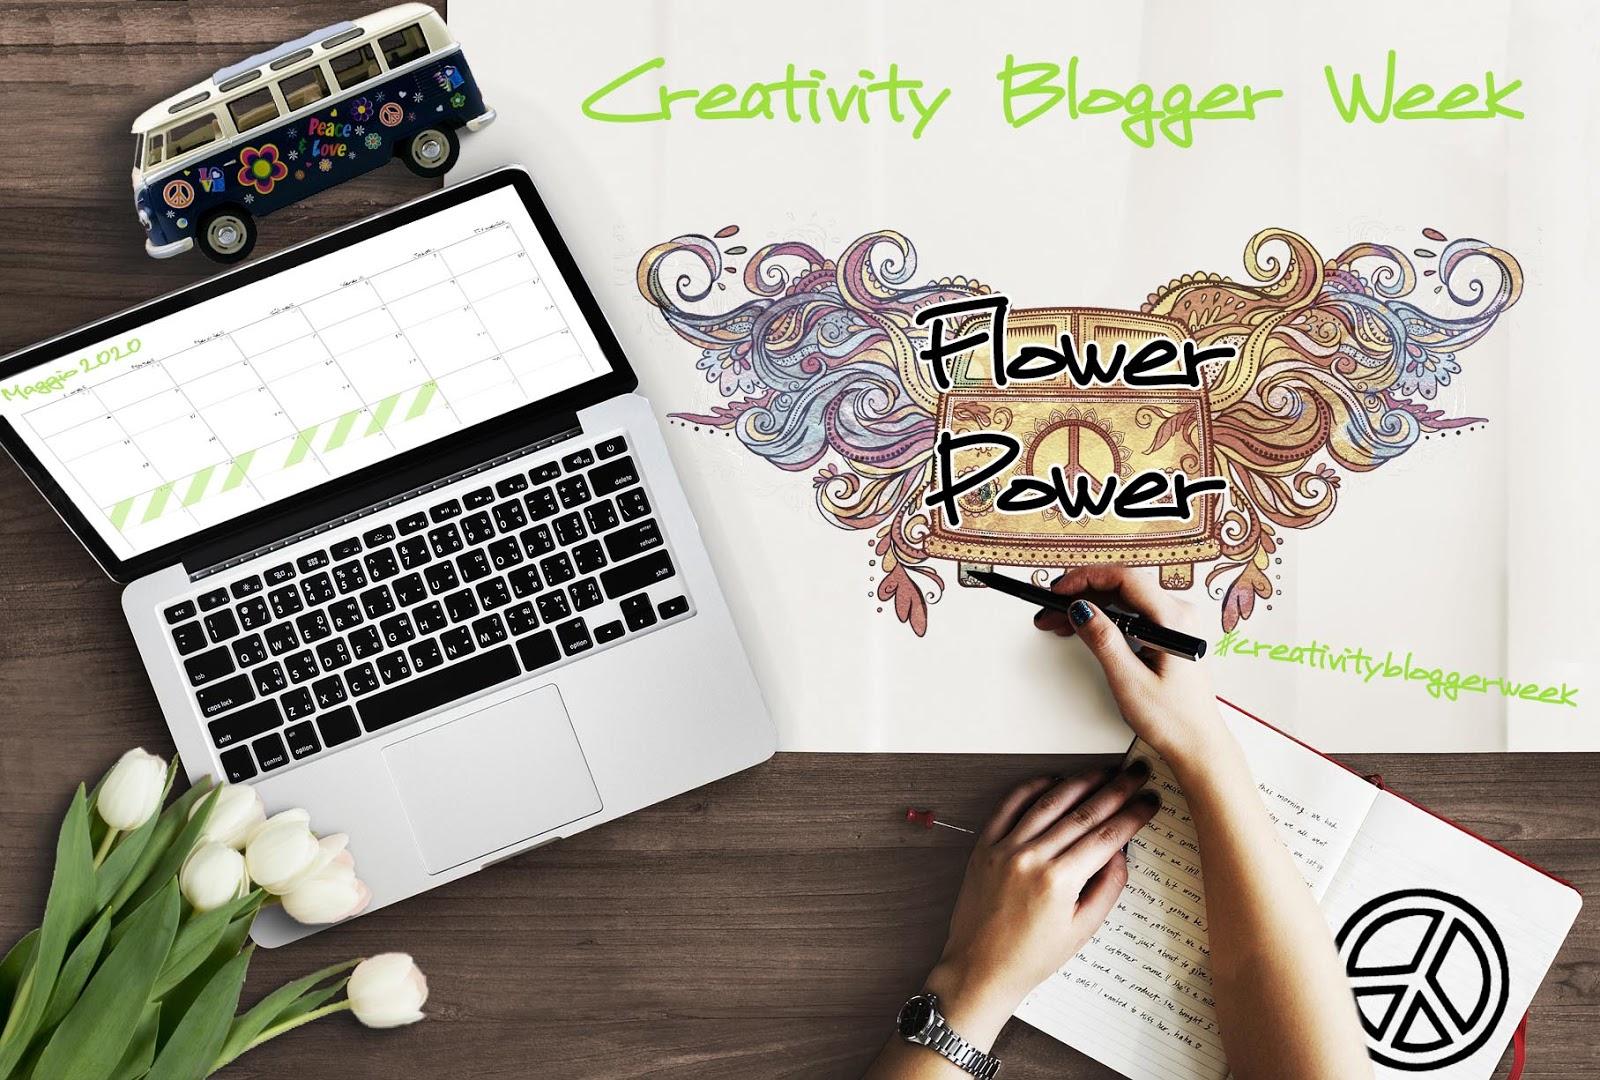 #CreativityBloggerWeek - Flower Power